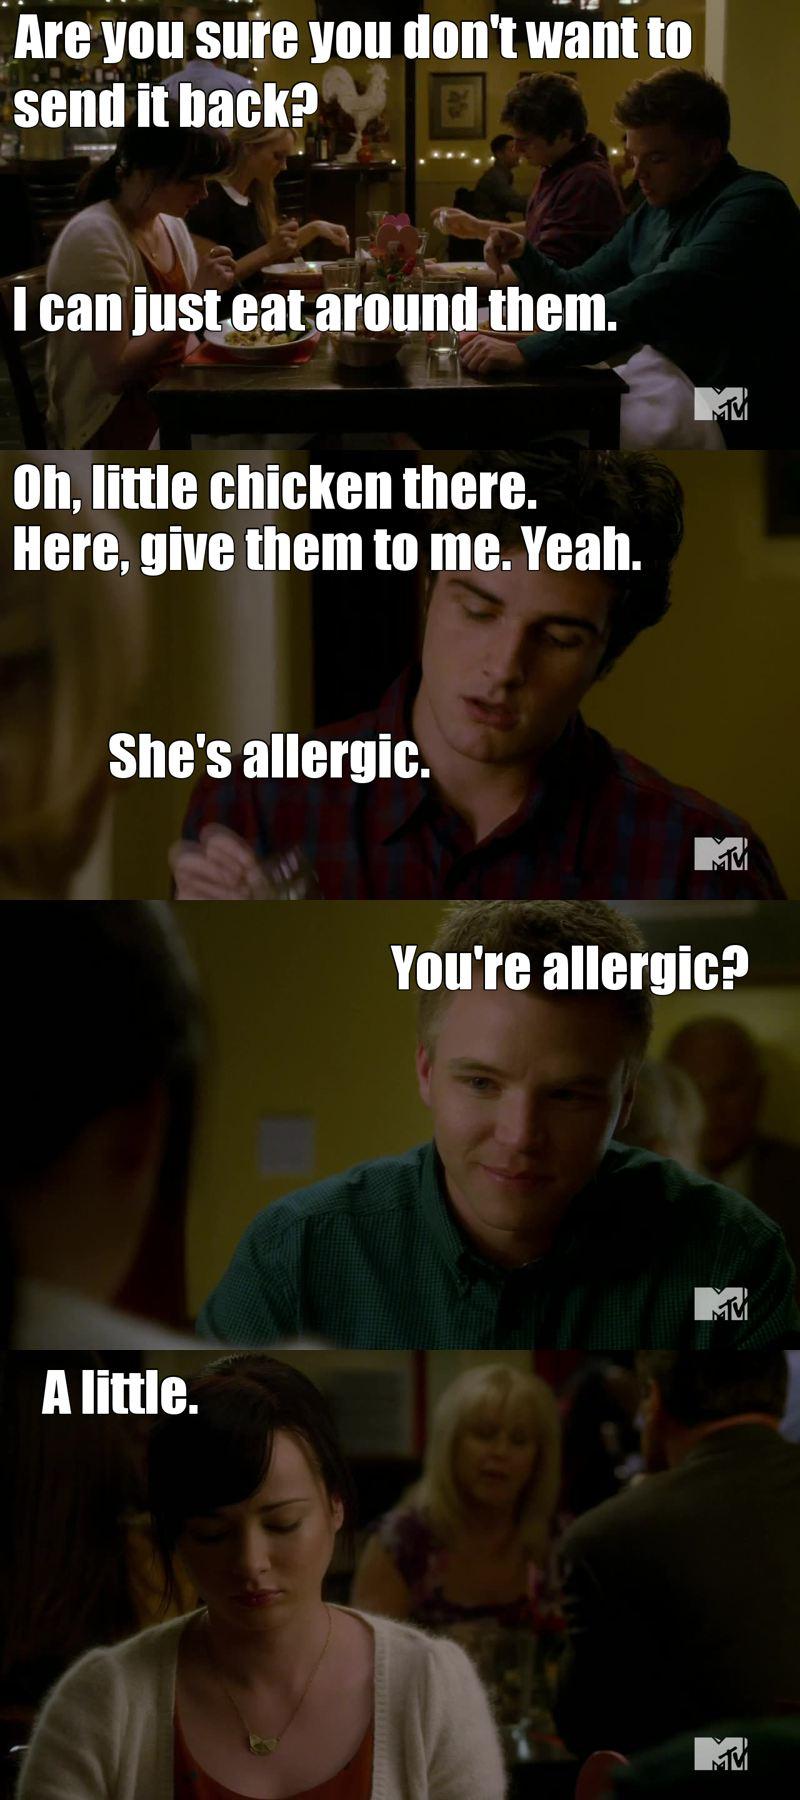 Matty knows Jenna better than Jake does! I repeat myself: MATTY KNOWS JENNA BETTER THAN JAKE DOES! *i need air*